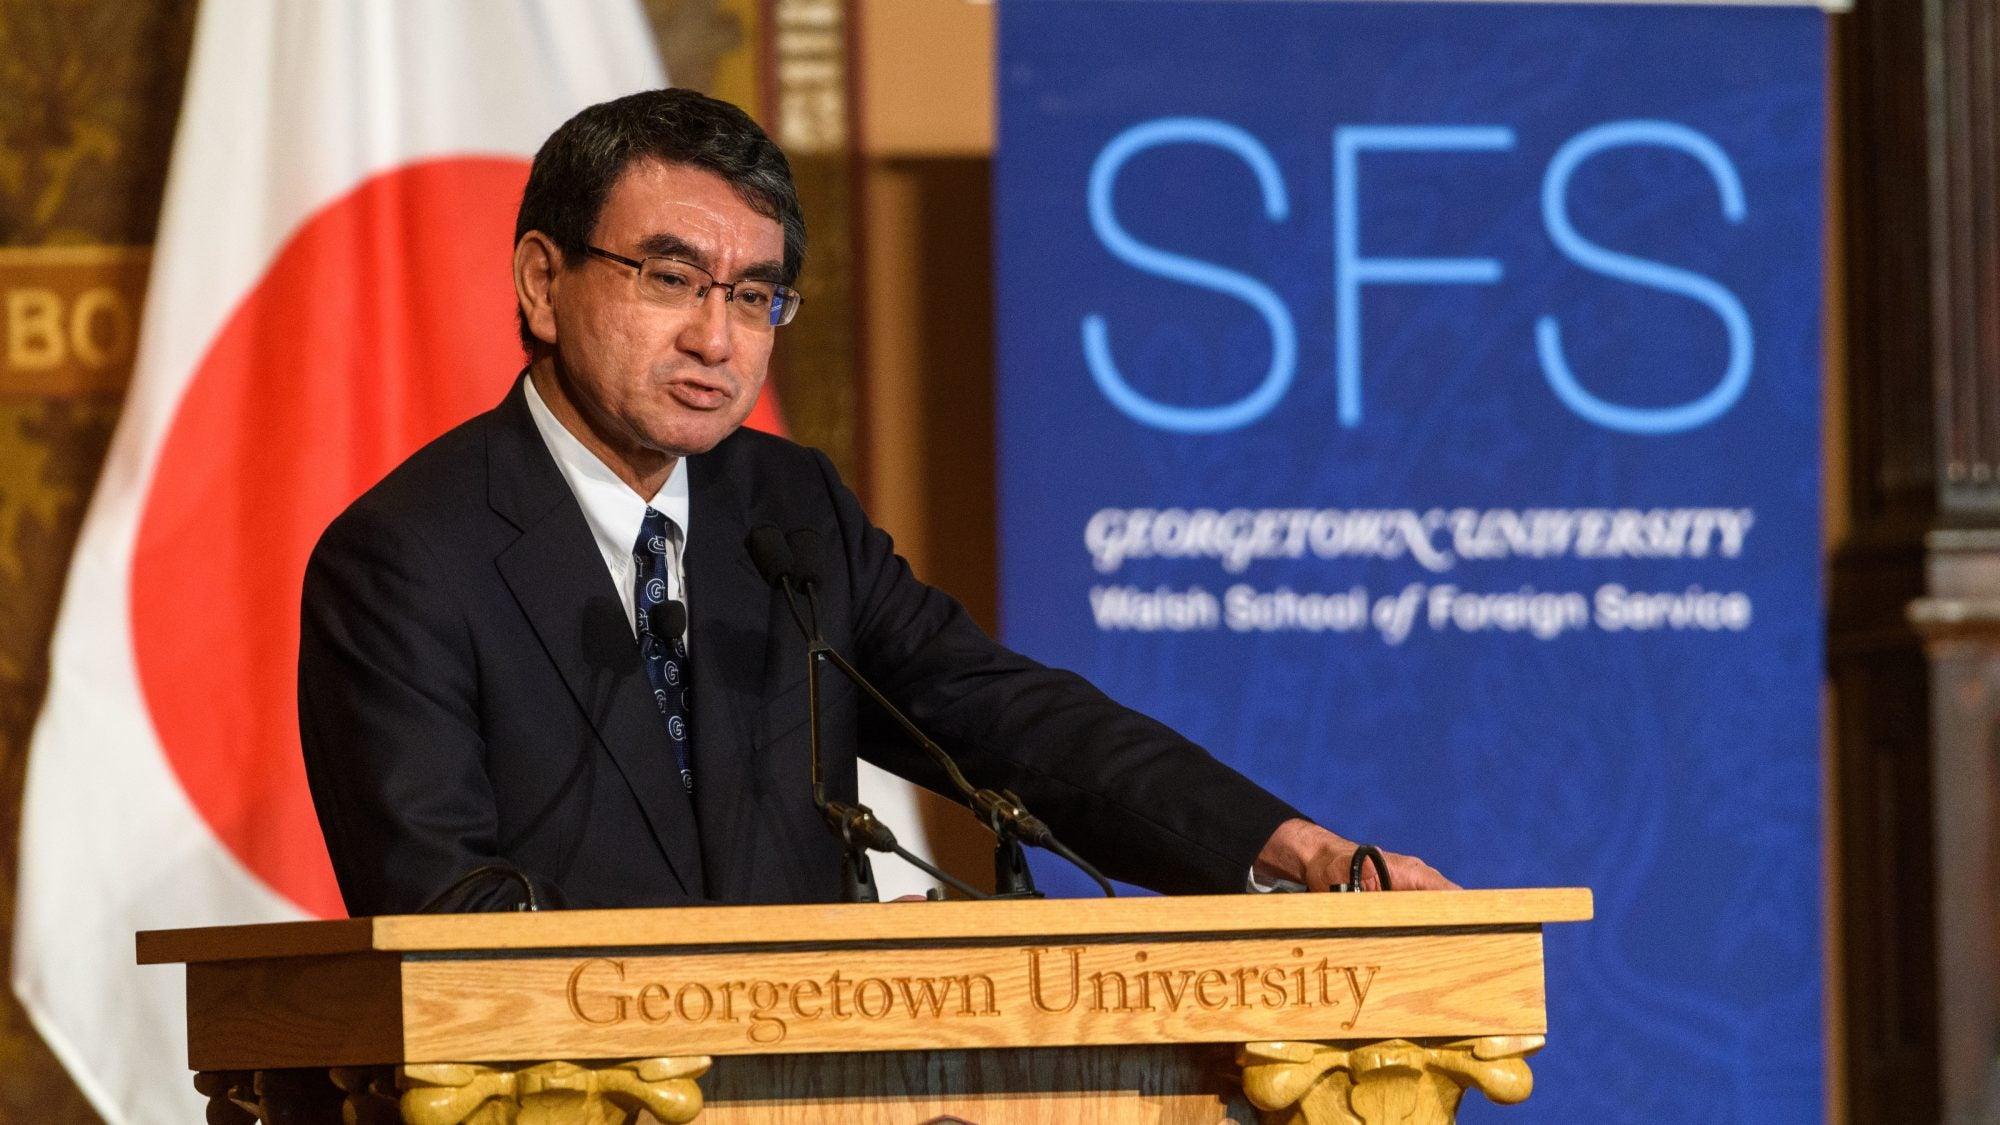 Kono Taro speaks from podium engraved with words